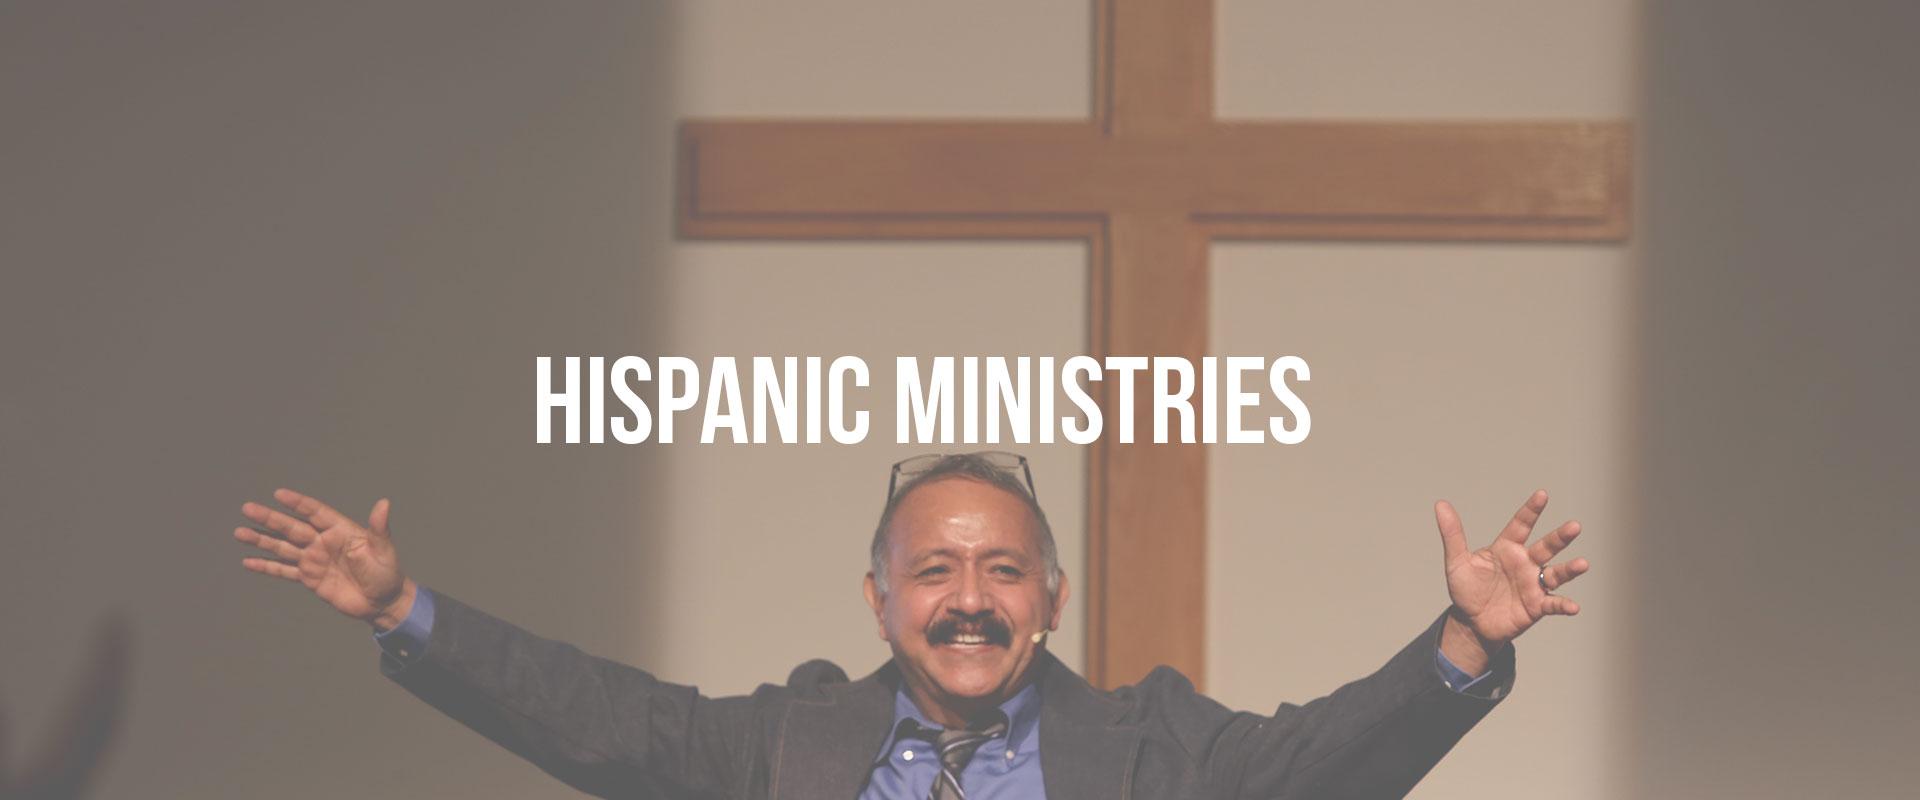 hispanic-ministries-header